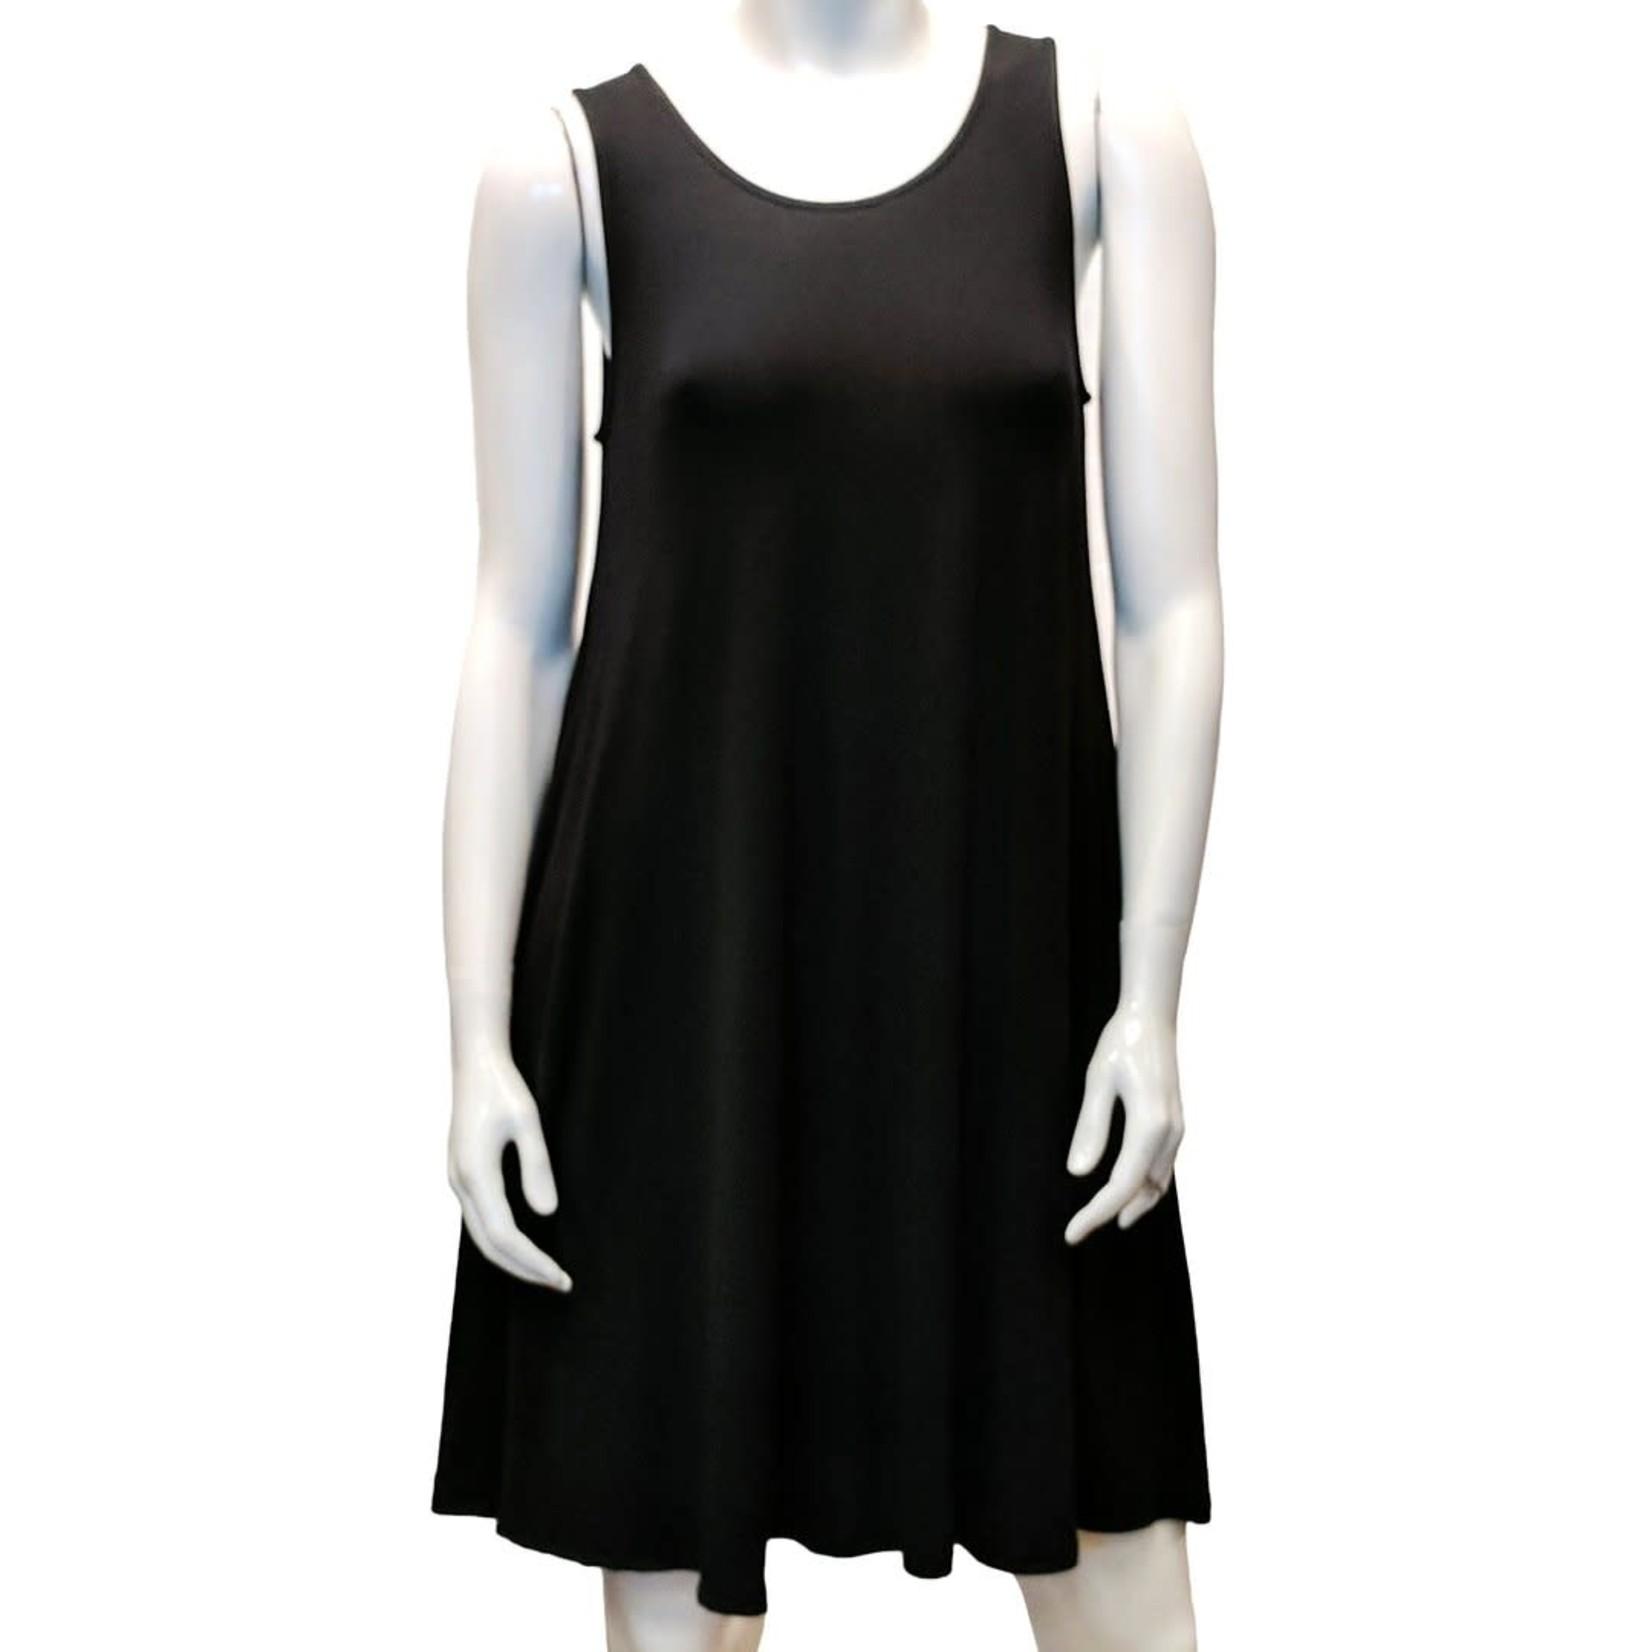 Gilmour Bamboo Sleeveless Pocket Swing Dress